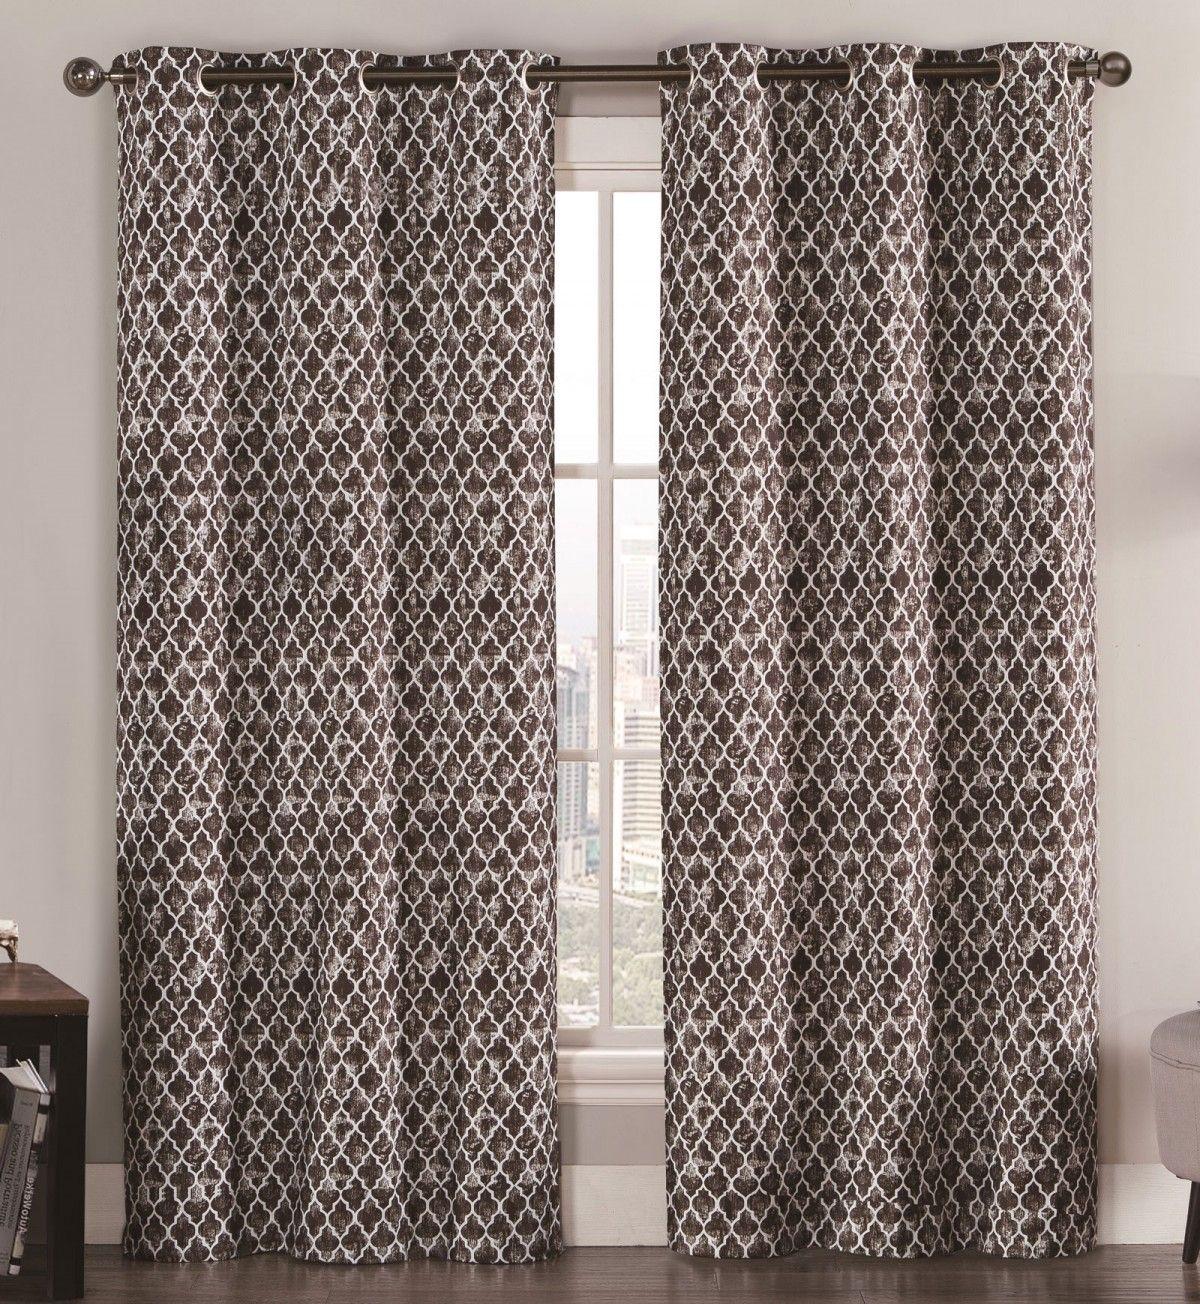 Vcny amadora blackout window curtains grommet thermal panel set